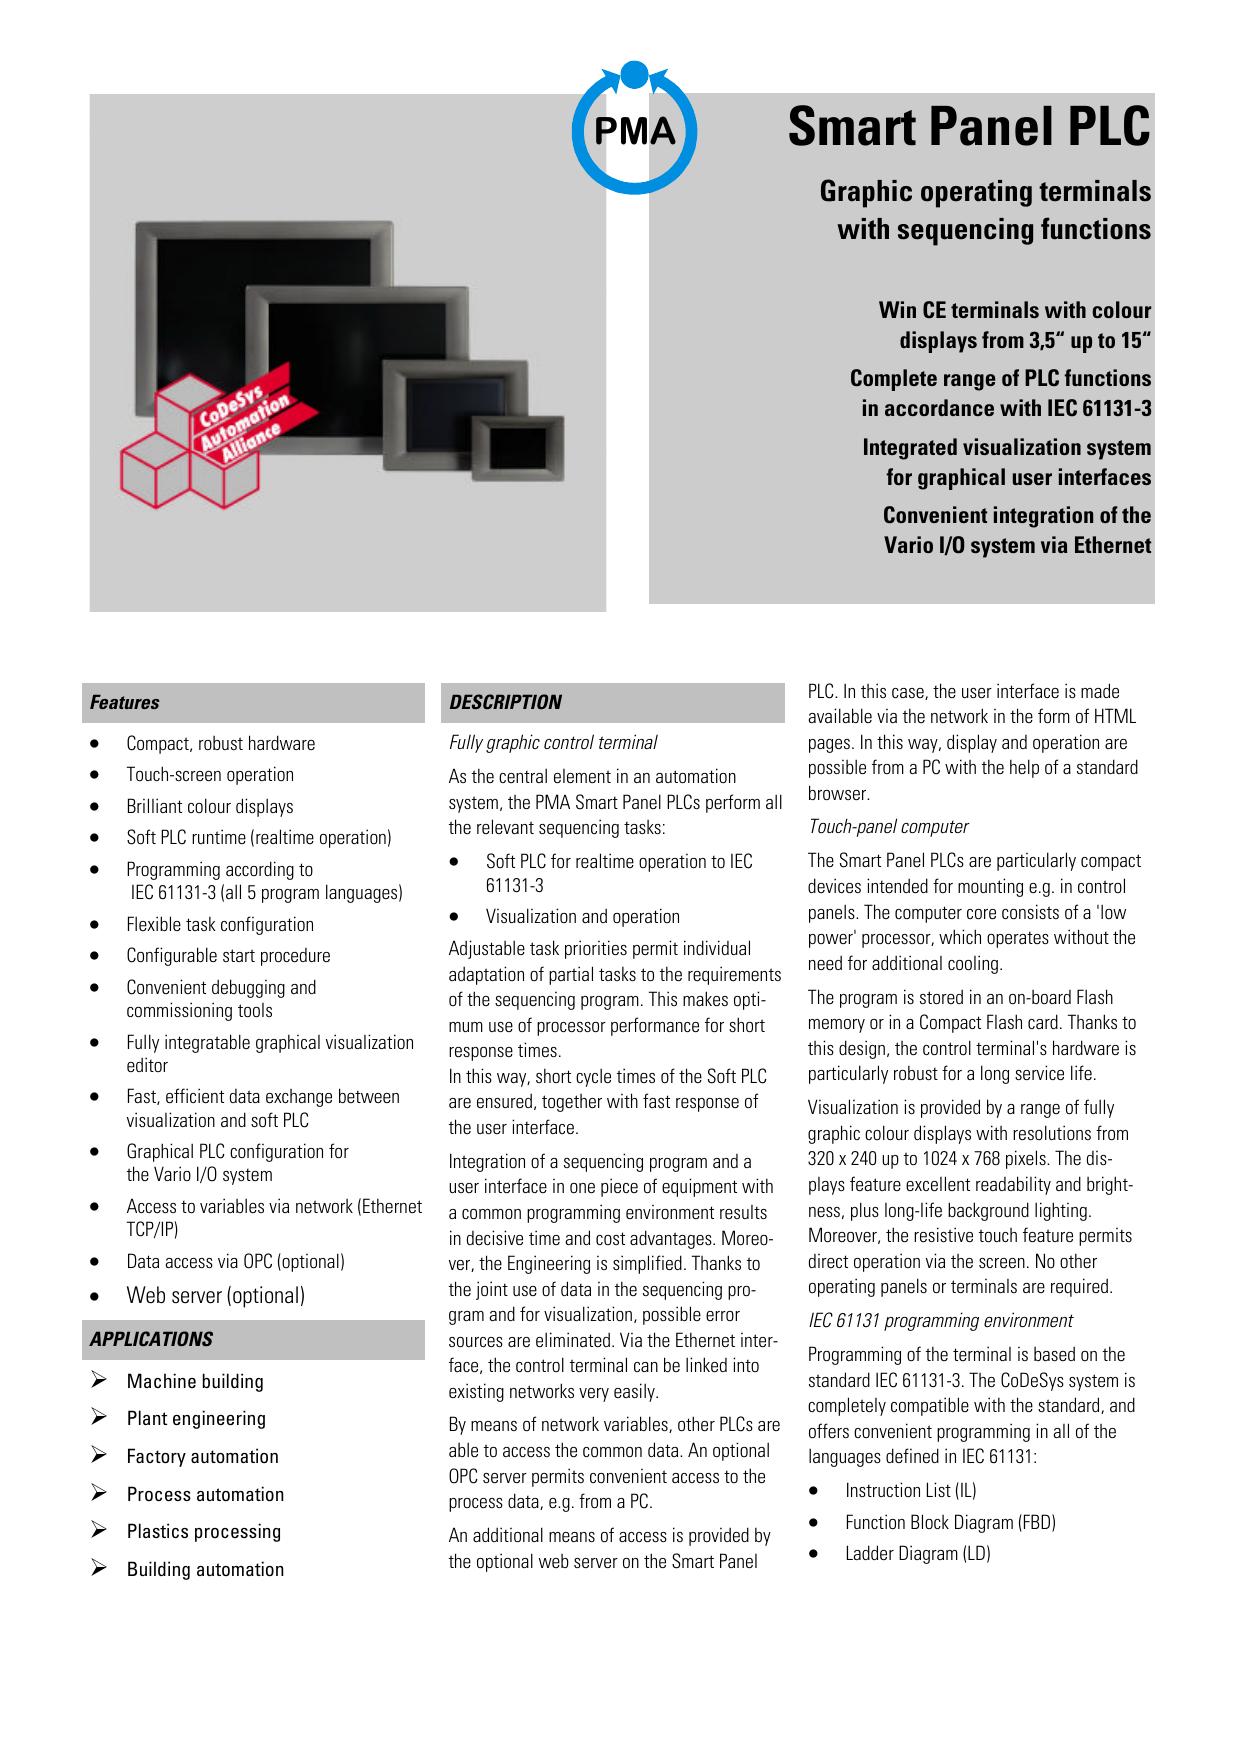 Smart Panel PLC - pma | manualzz com